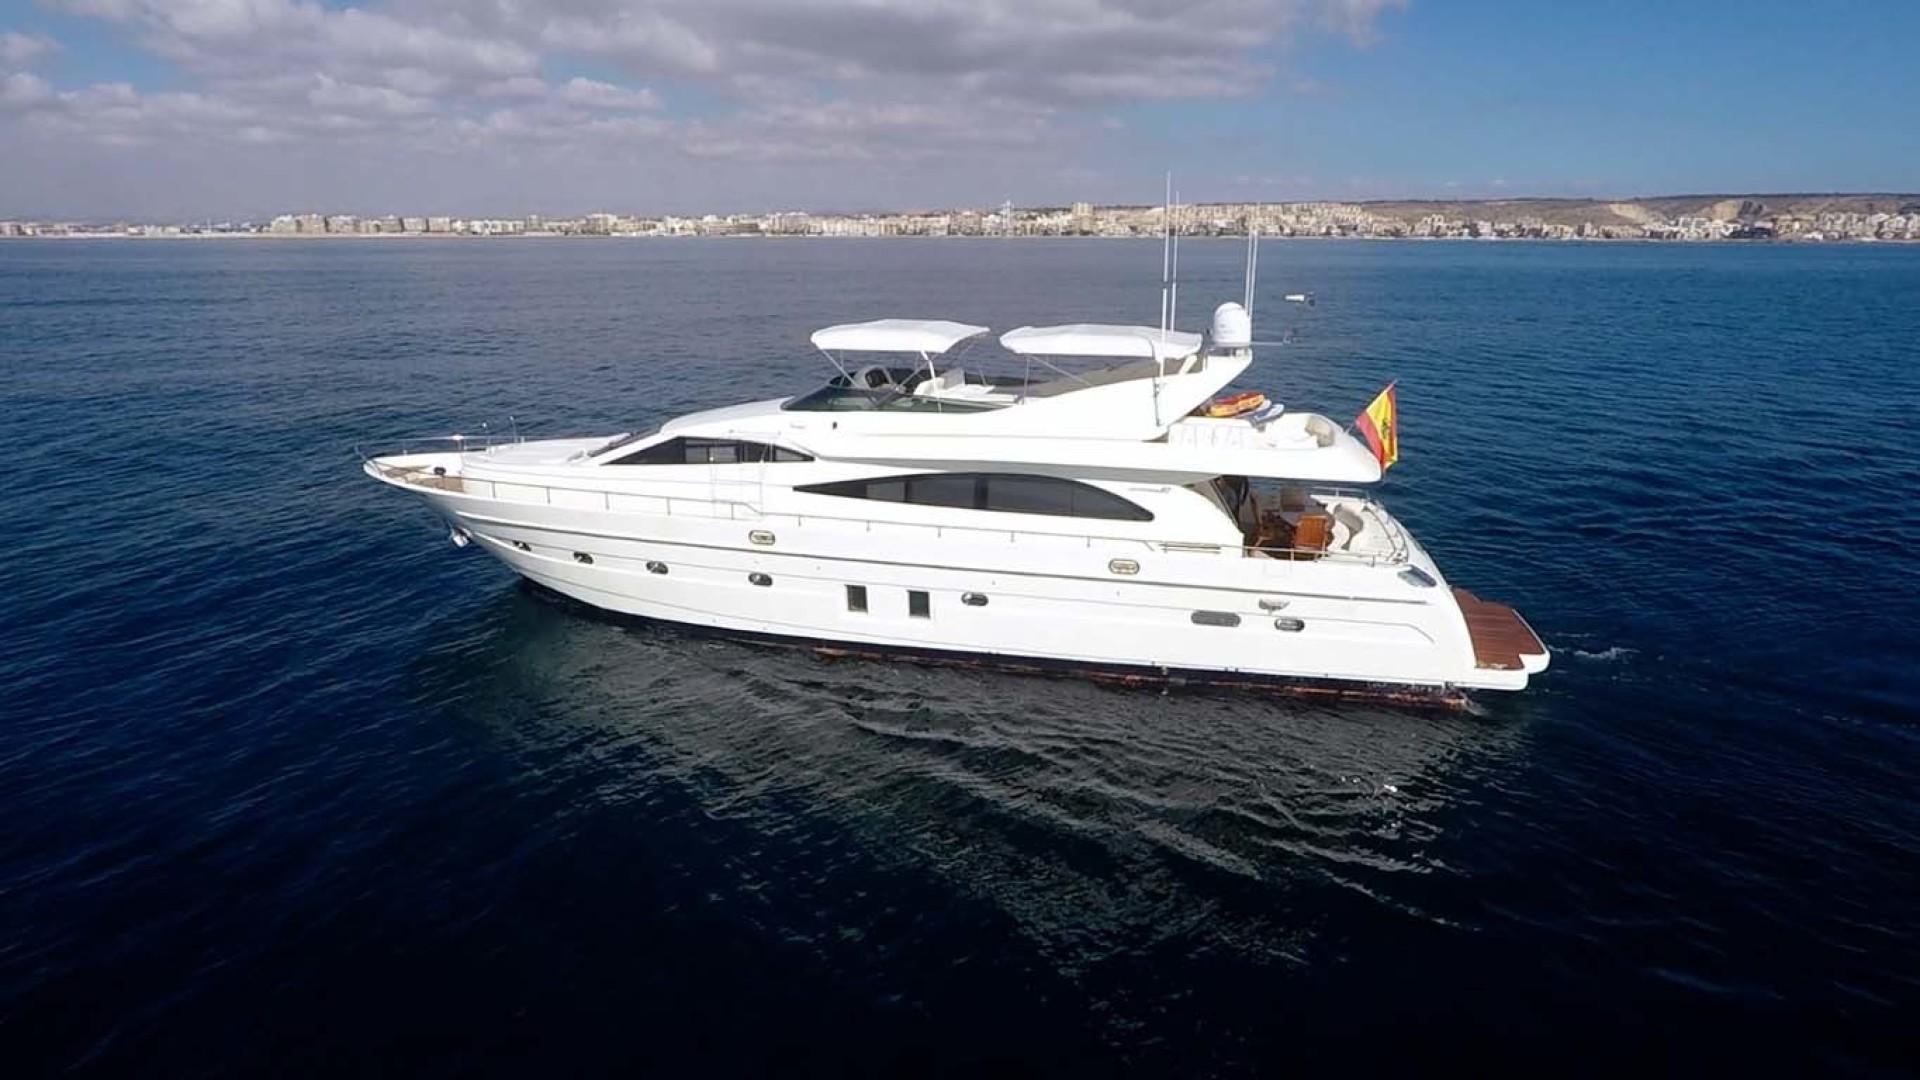 Astondoa-82 GLX 2006-Hemera Cuarta Ibiza-Spain-Port View-1239818   Thumbnail